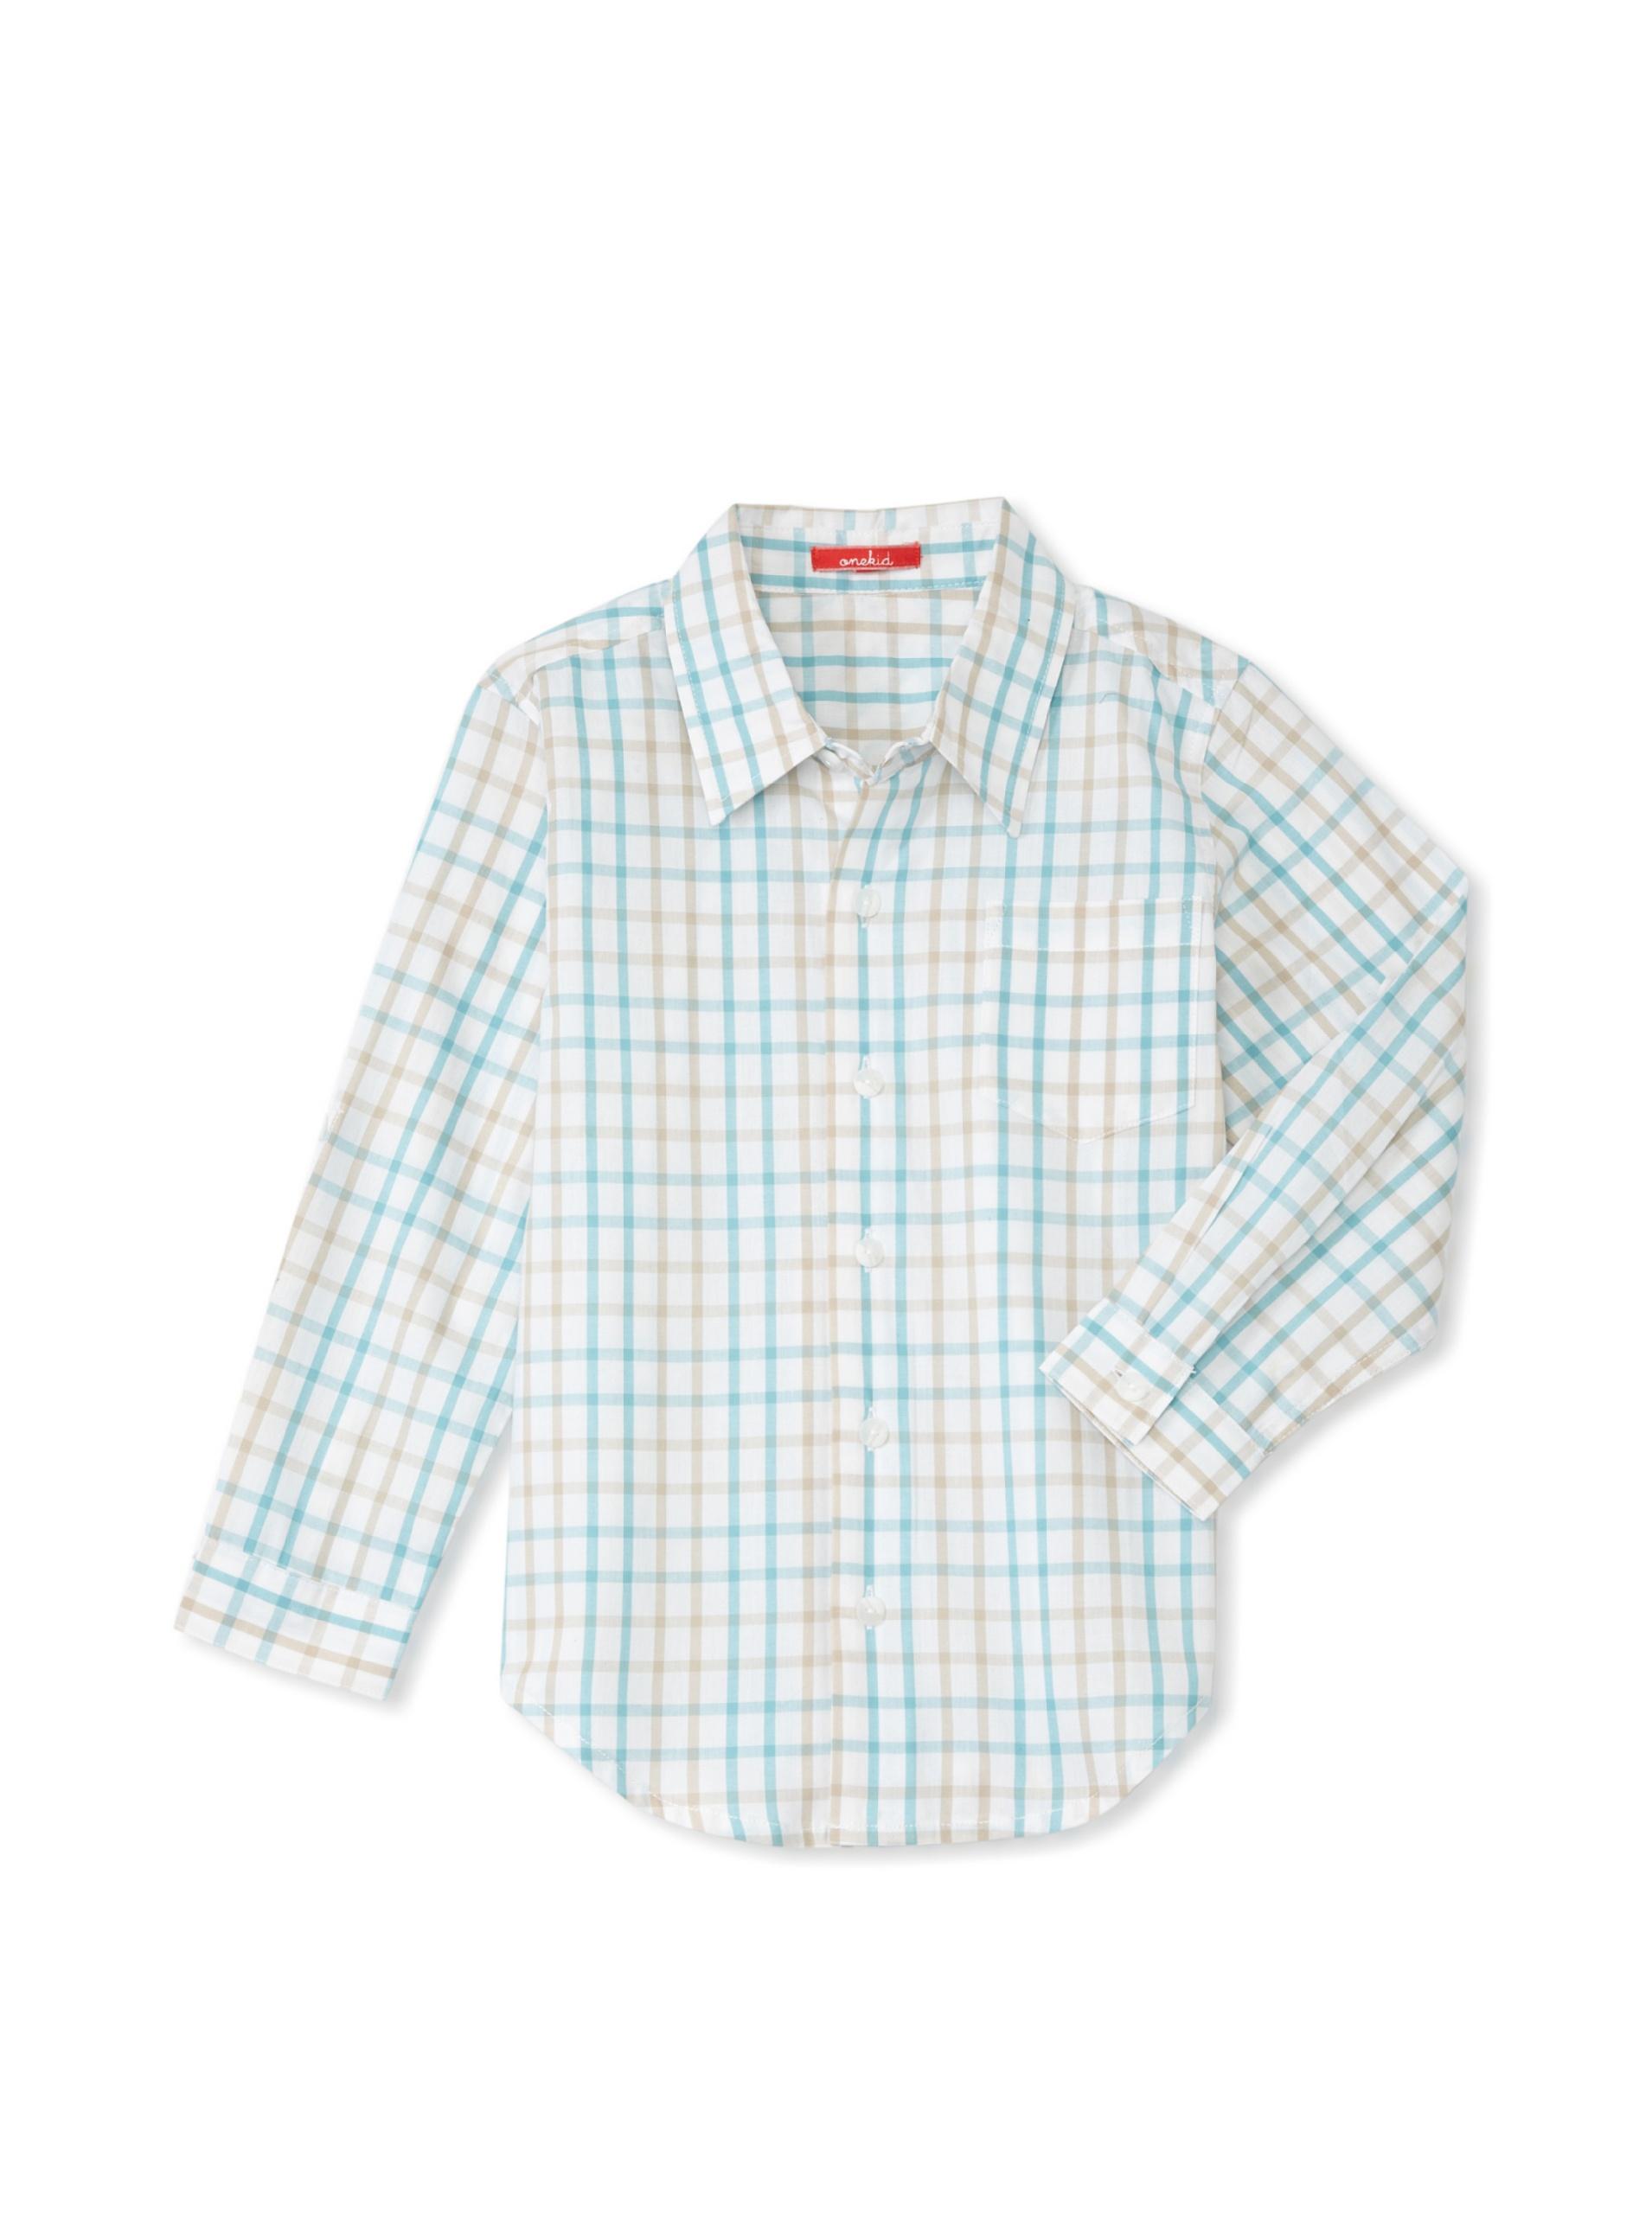 One Kid Boy's Checkered Shirt (Aqua Check)